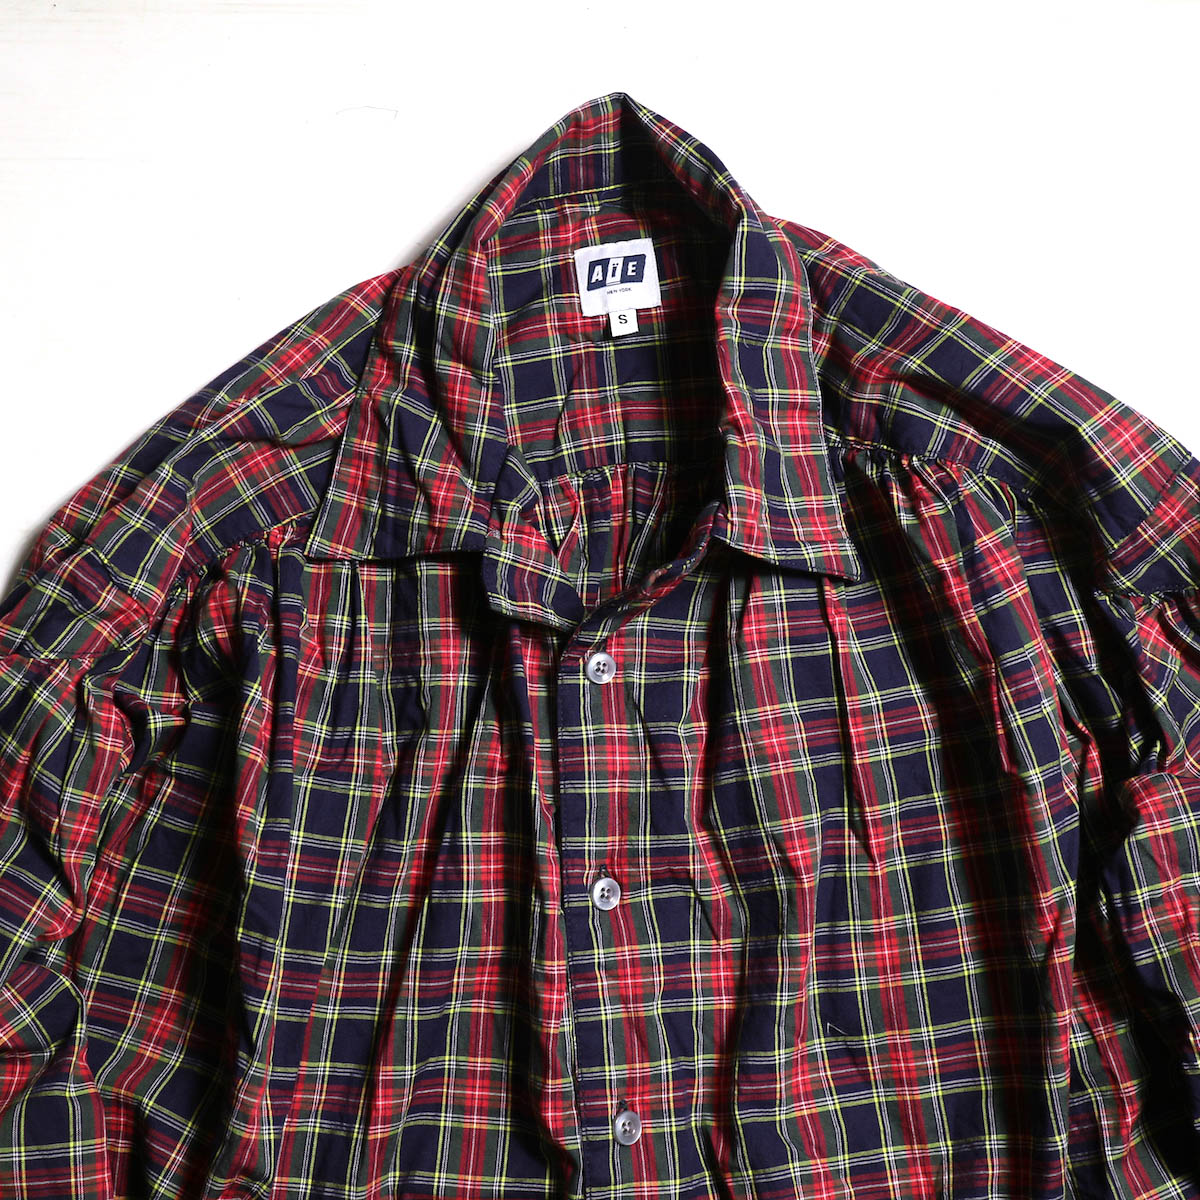 AiE / Painter Shirt -Tartan Check -Nvy/Red